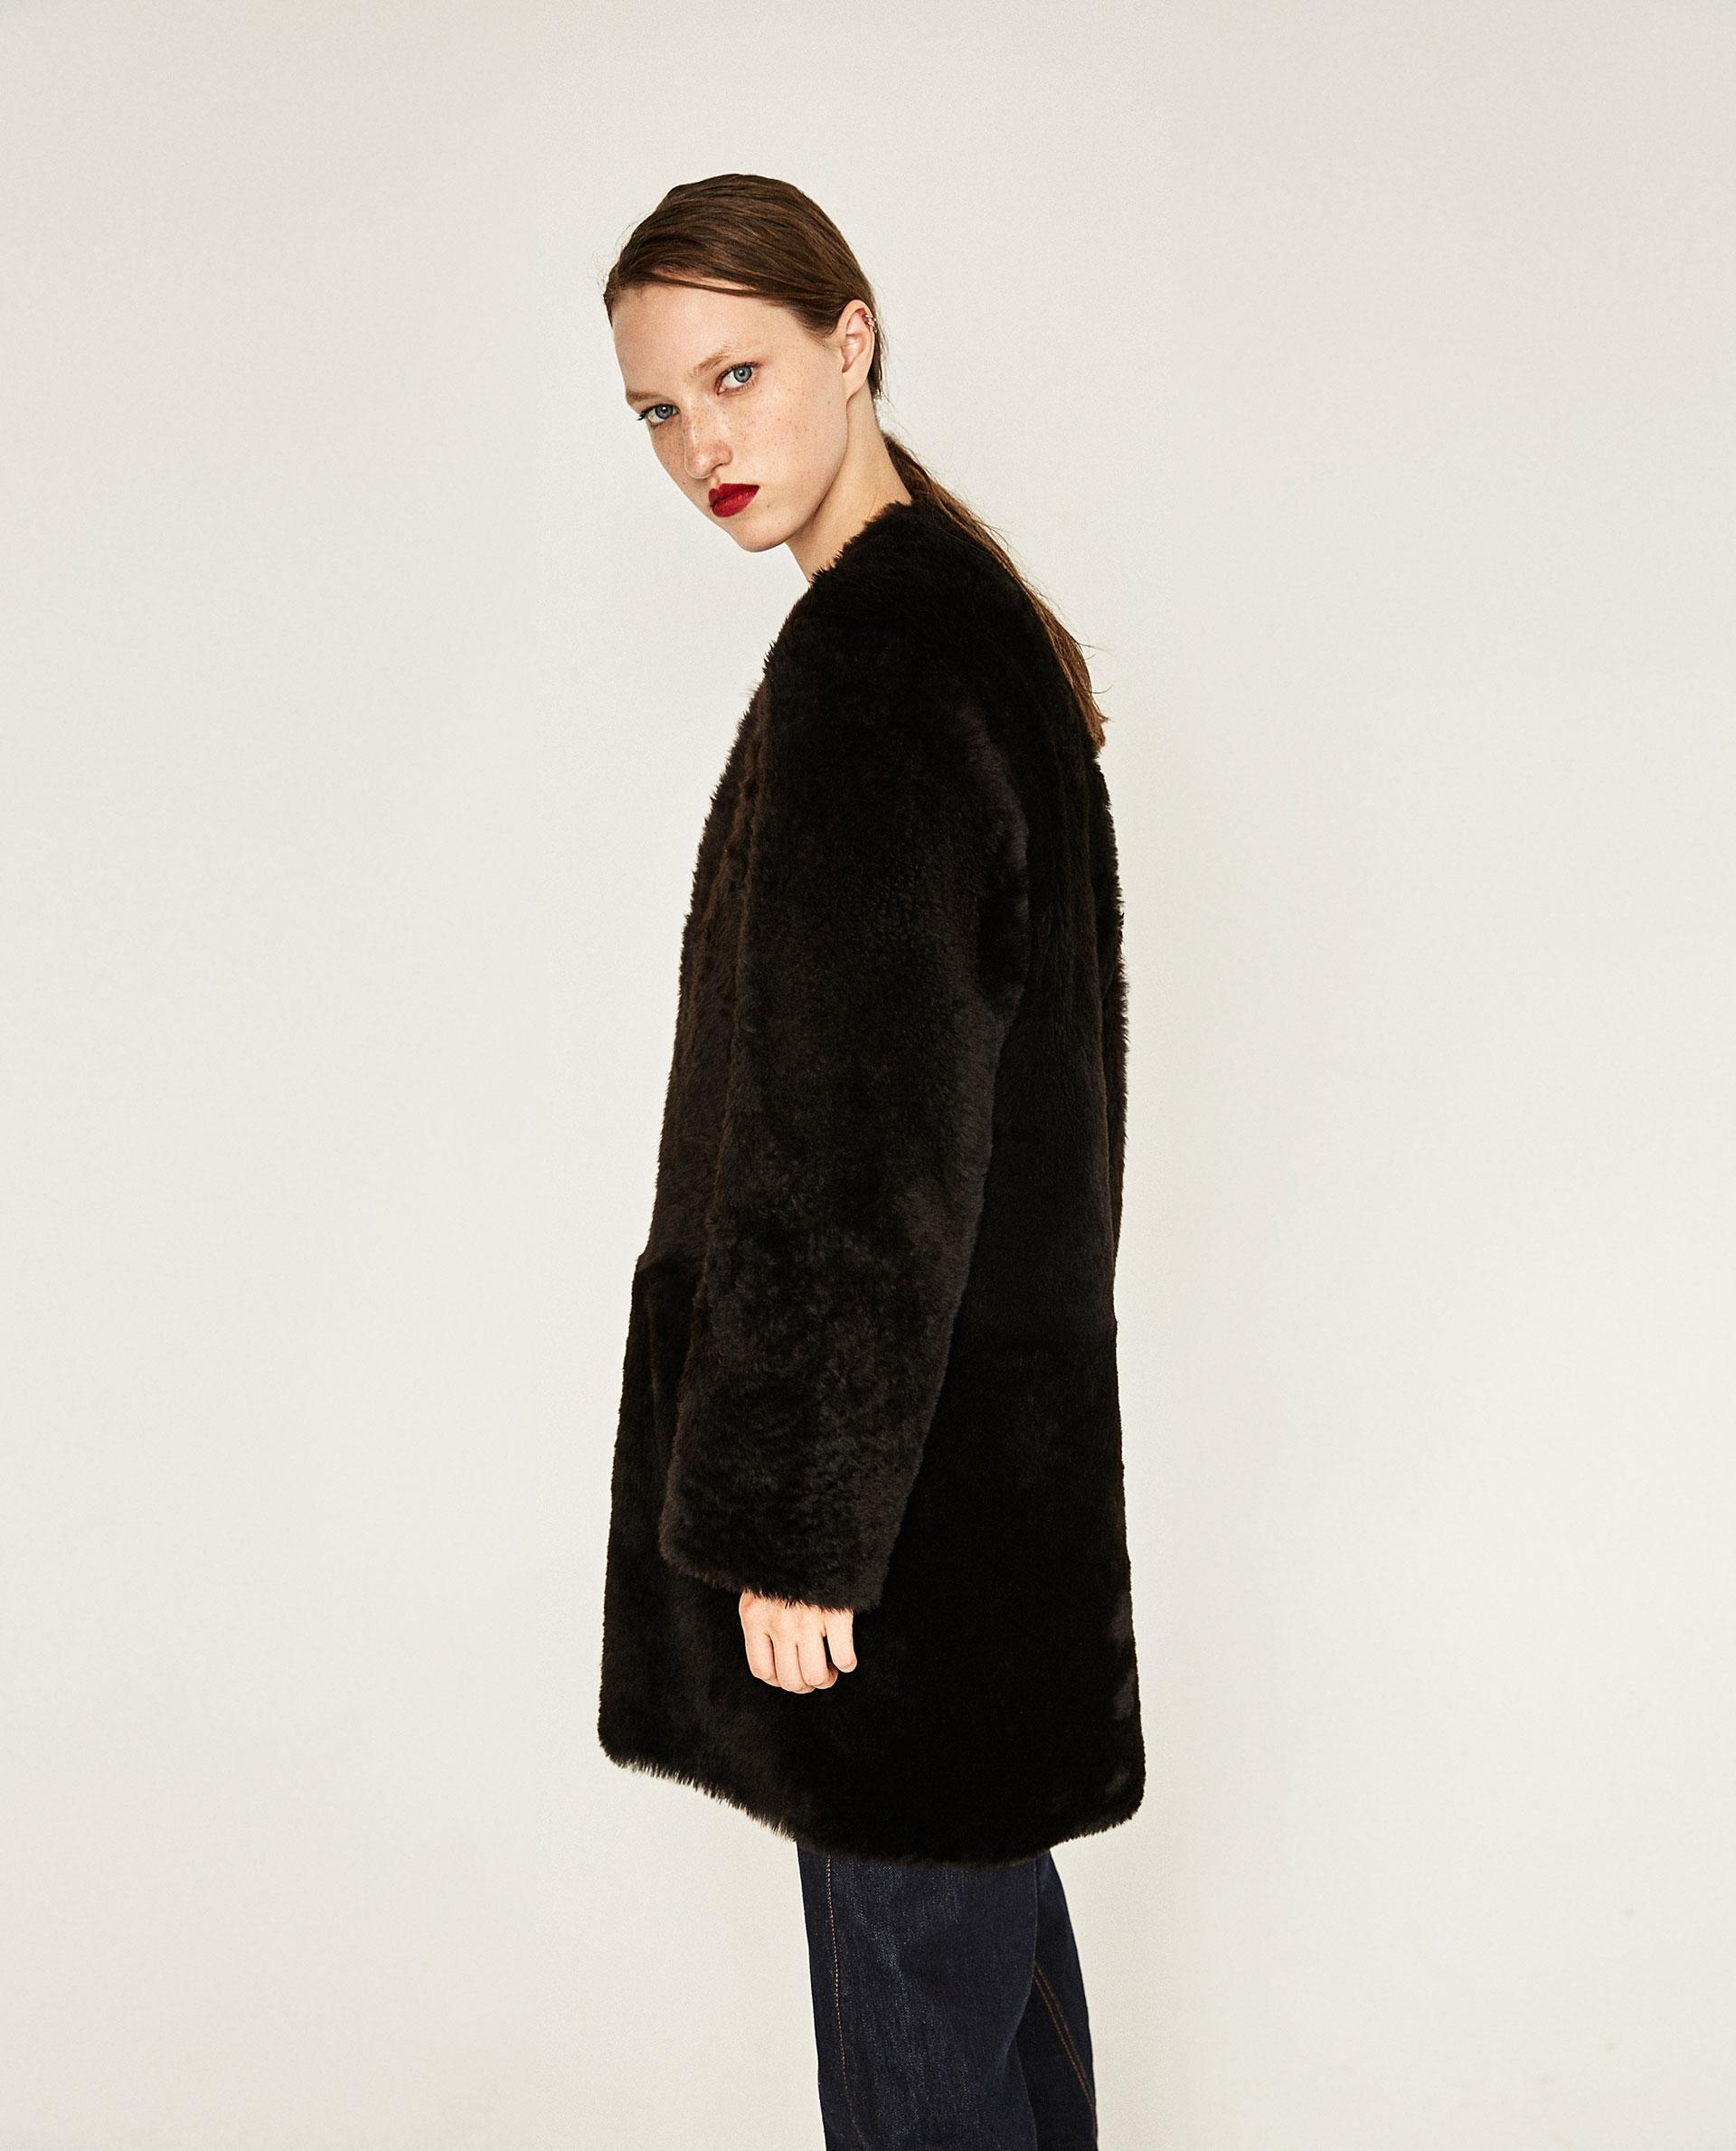 lambskin leather coat $580